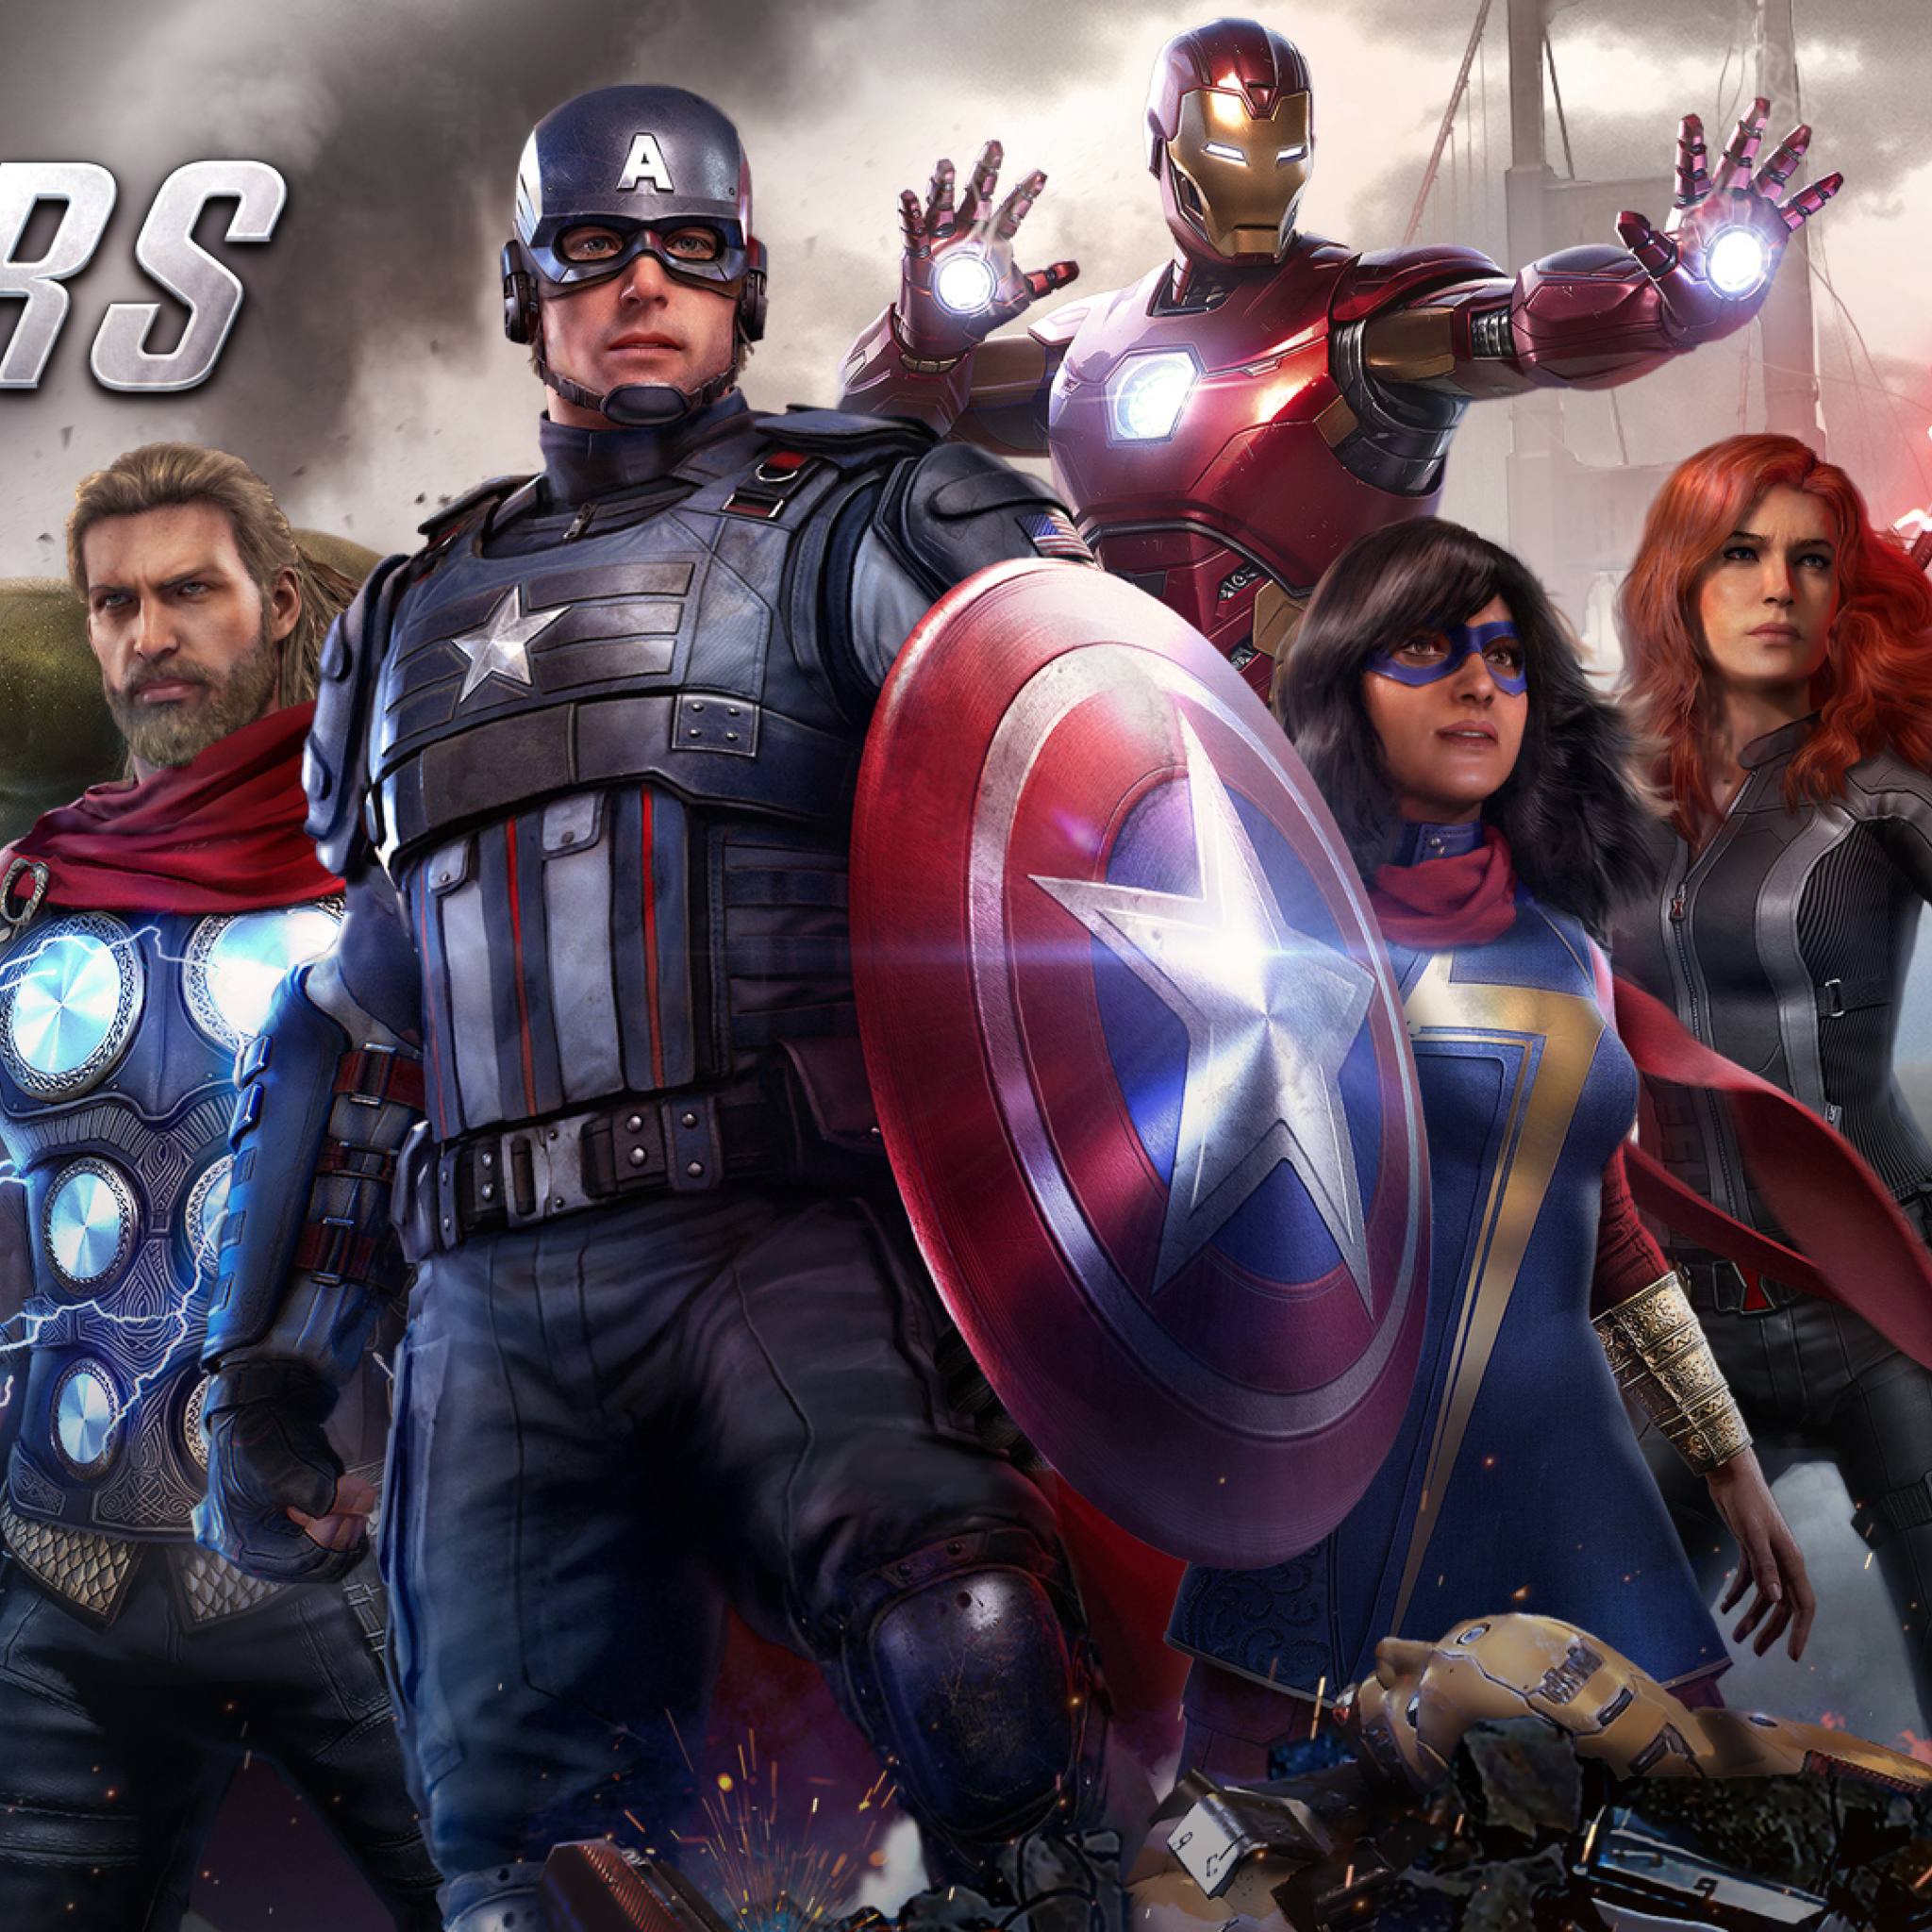 2048x2048 Marvel's Avengers Video Game Ipad Air Wallpaper